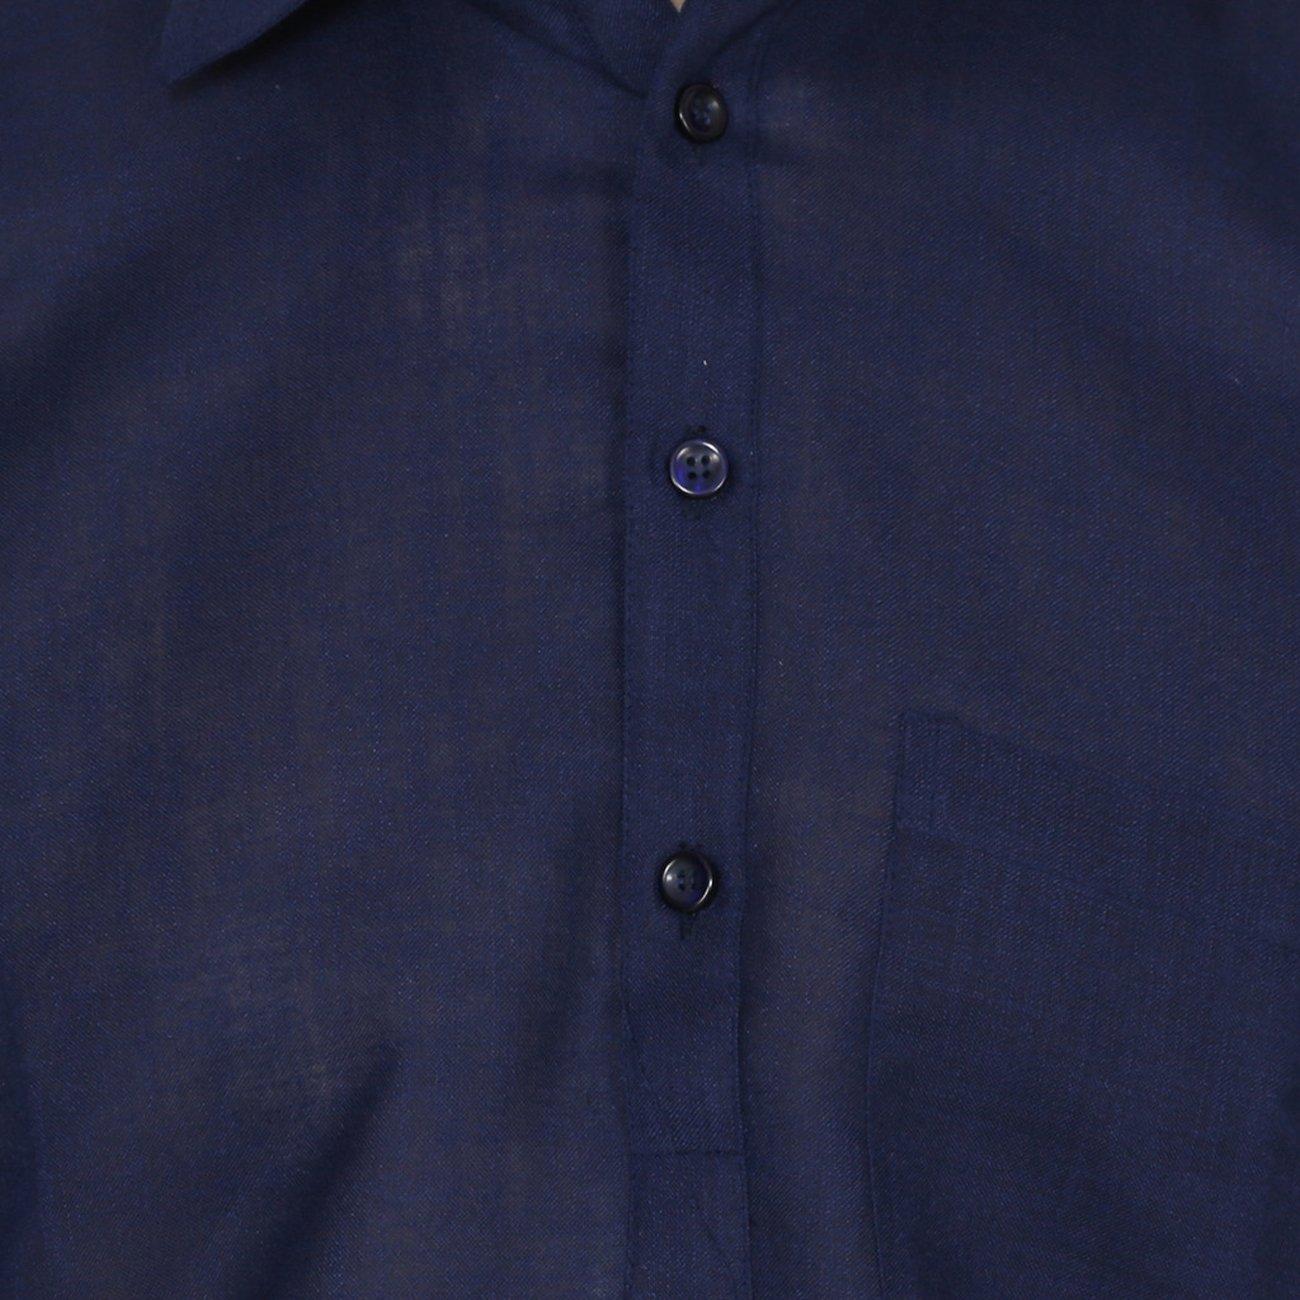 Wondercraft Ethnic Mens Linen Pathani Suit